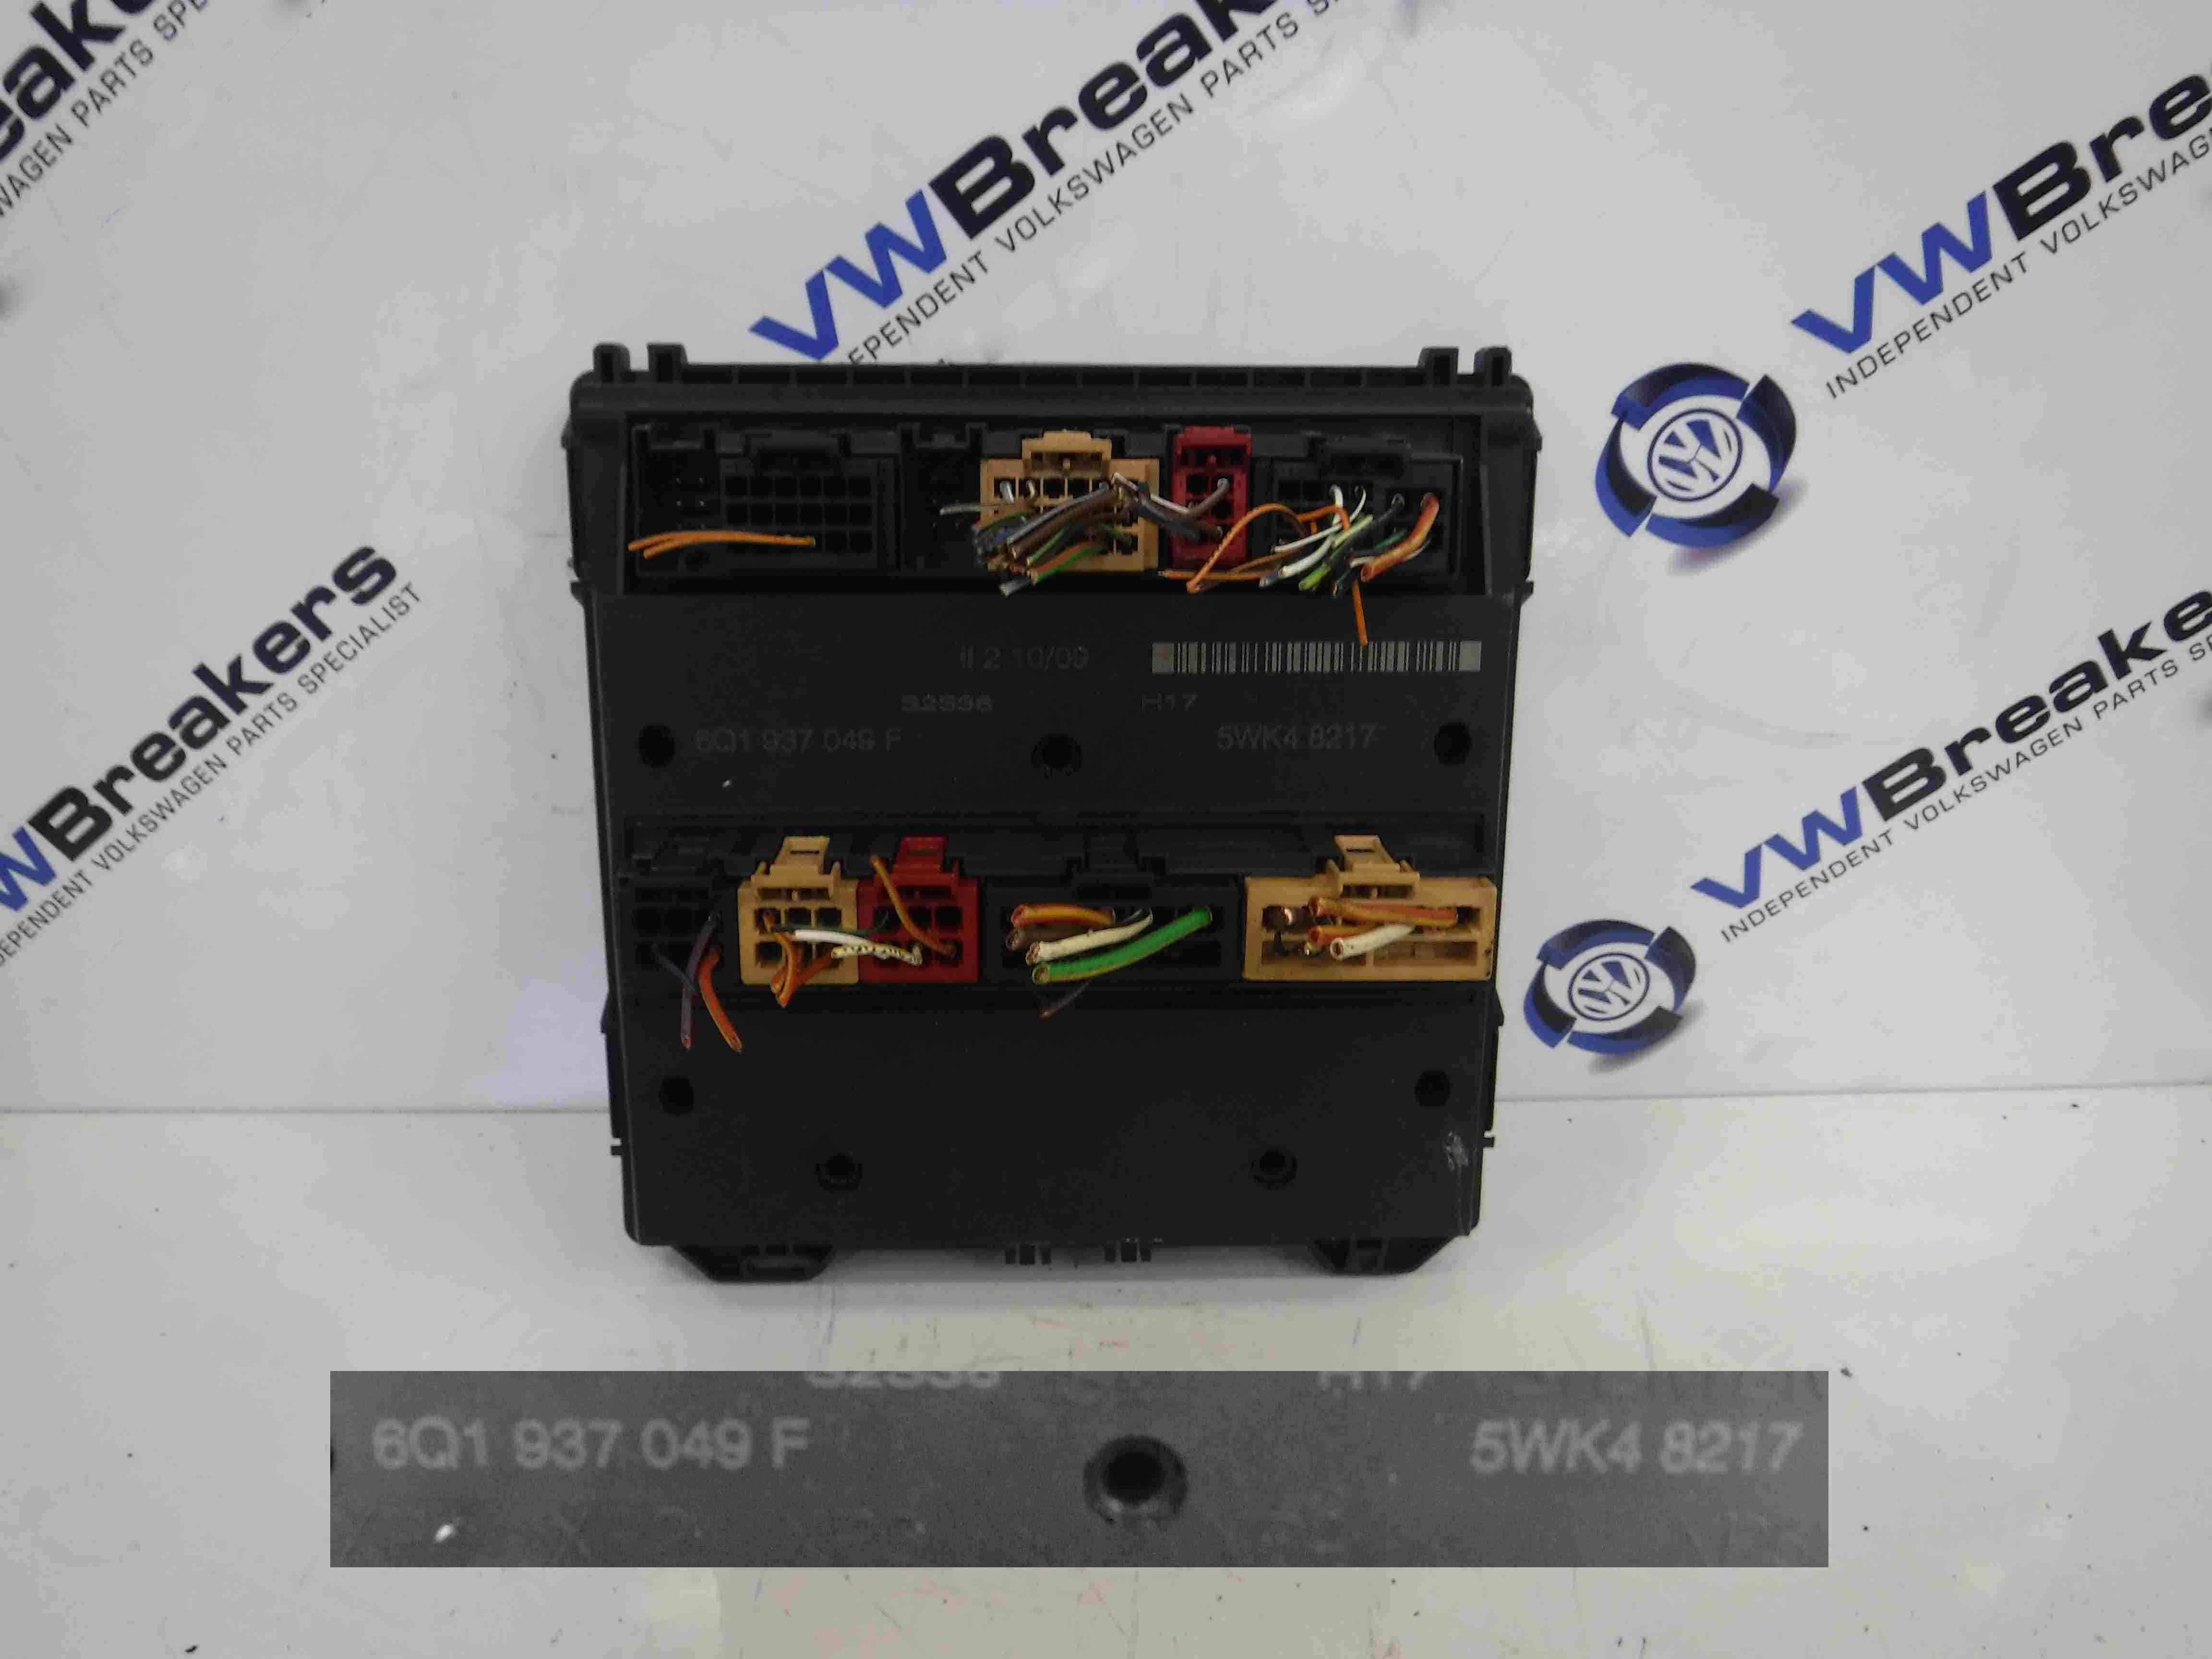 Volkswagen Polo 9N3 2006-2008 Comfort Control Module 6Q1937049F 5WK48217